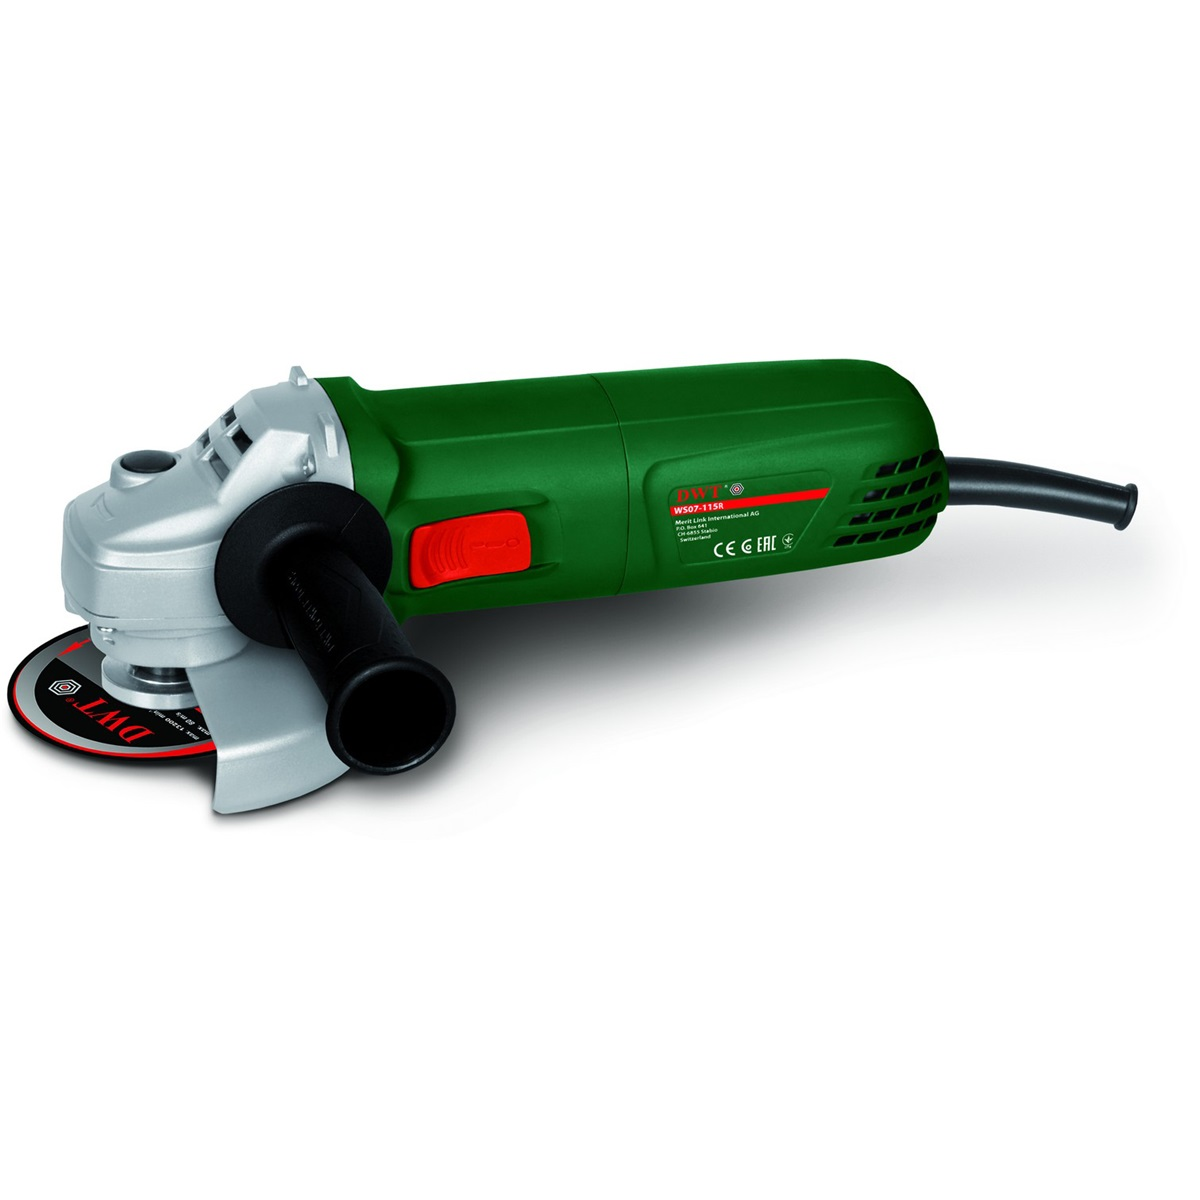 elektrická úhlová bruska 115 mm DWT WS07-115R